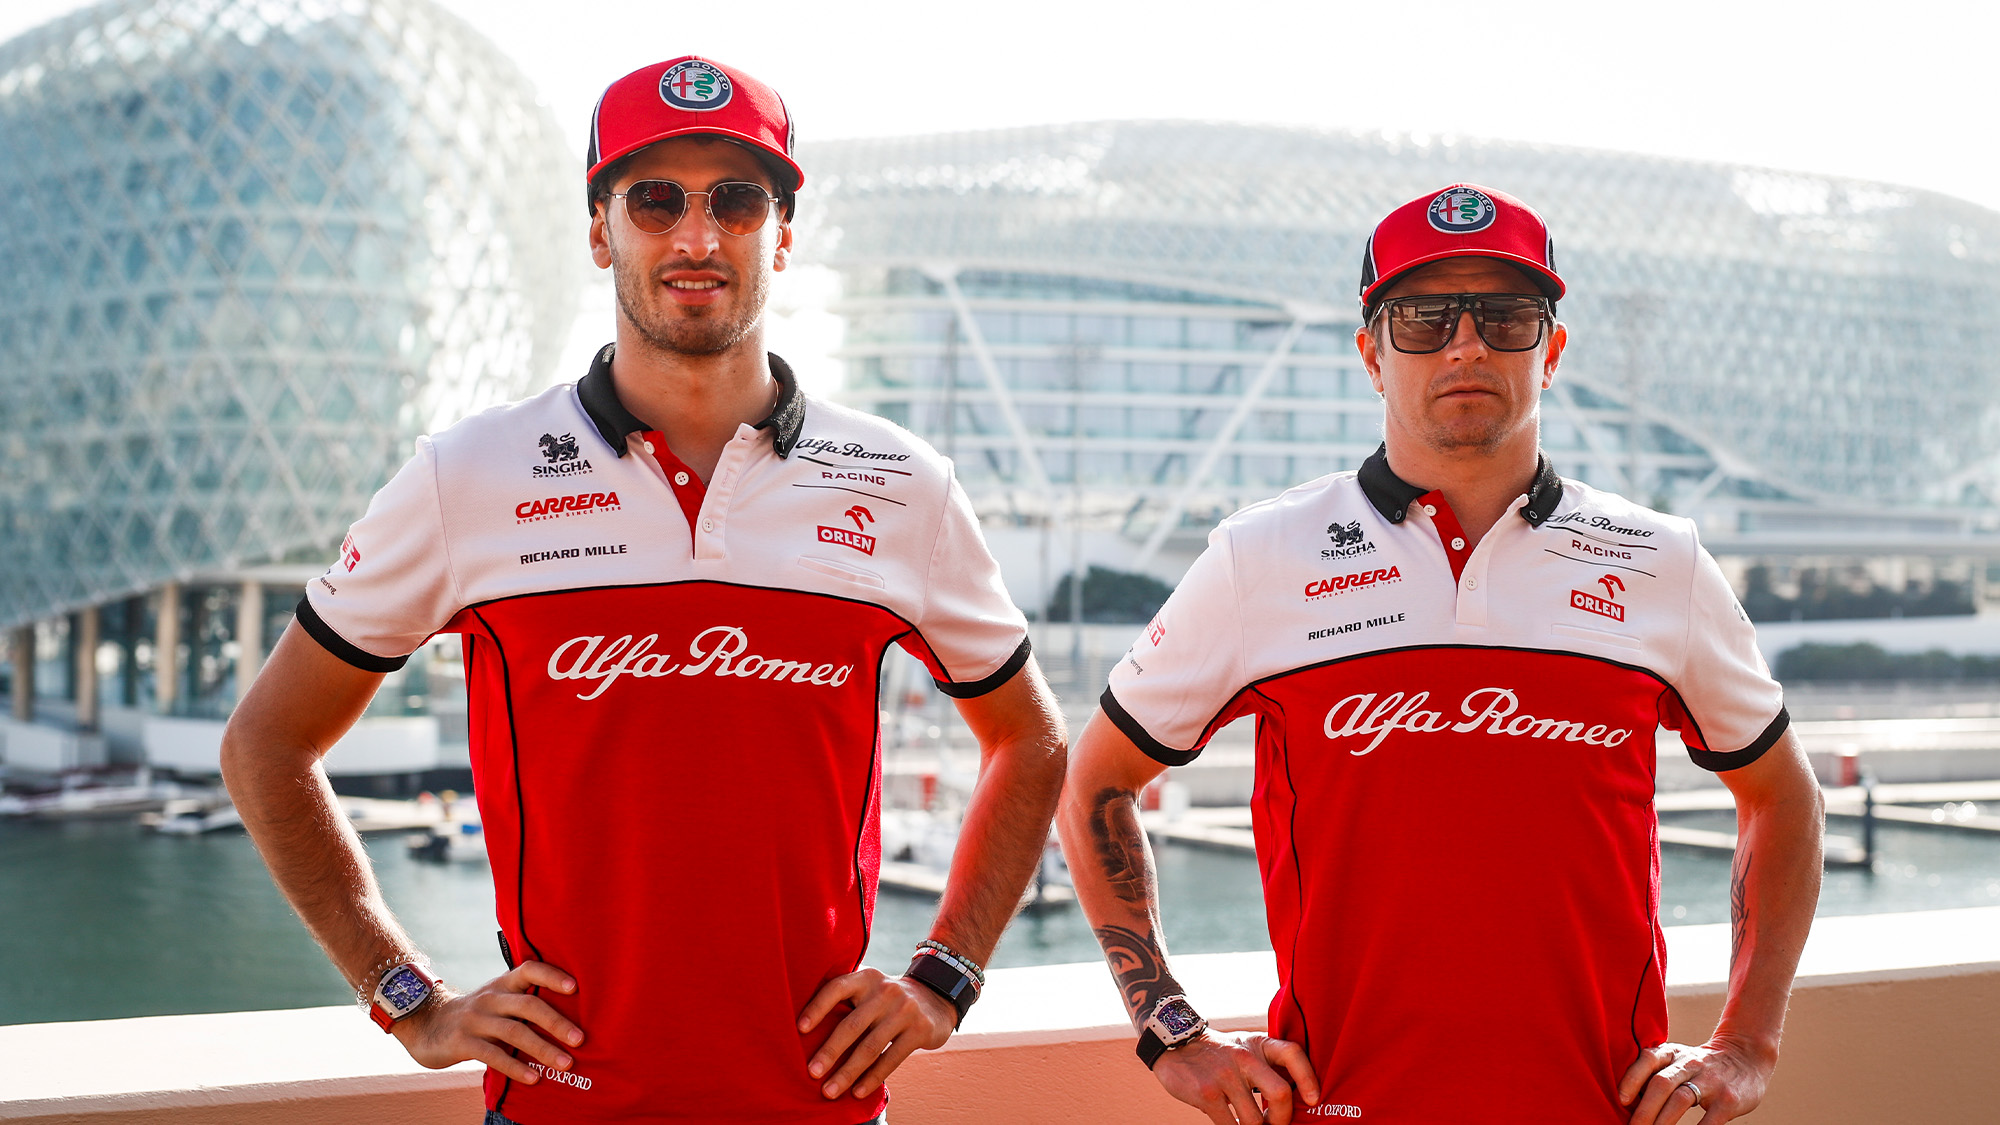 Antonio Giovinazzi and Kimi Raikkonen ahead of the 2021 F1 season